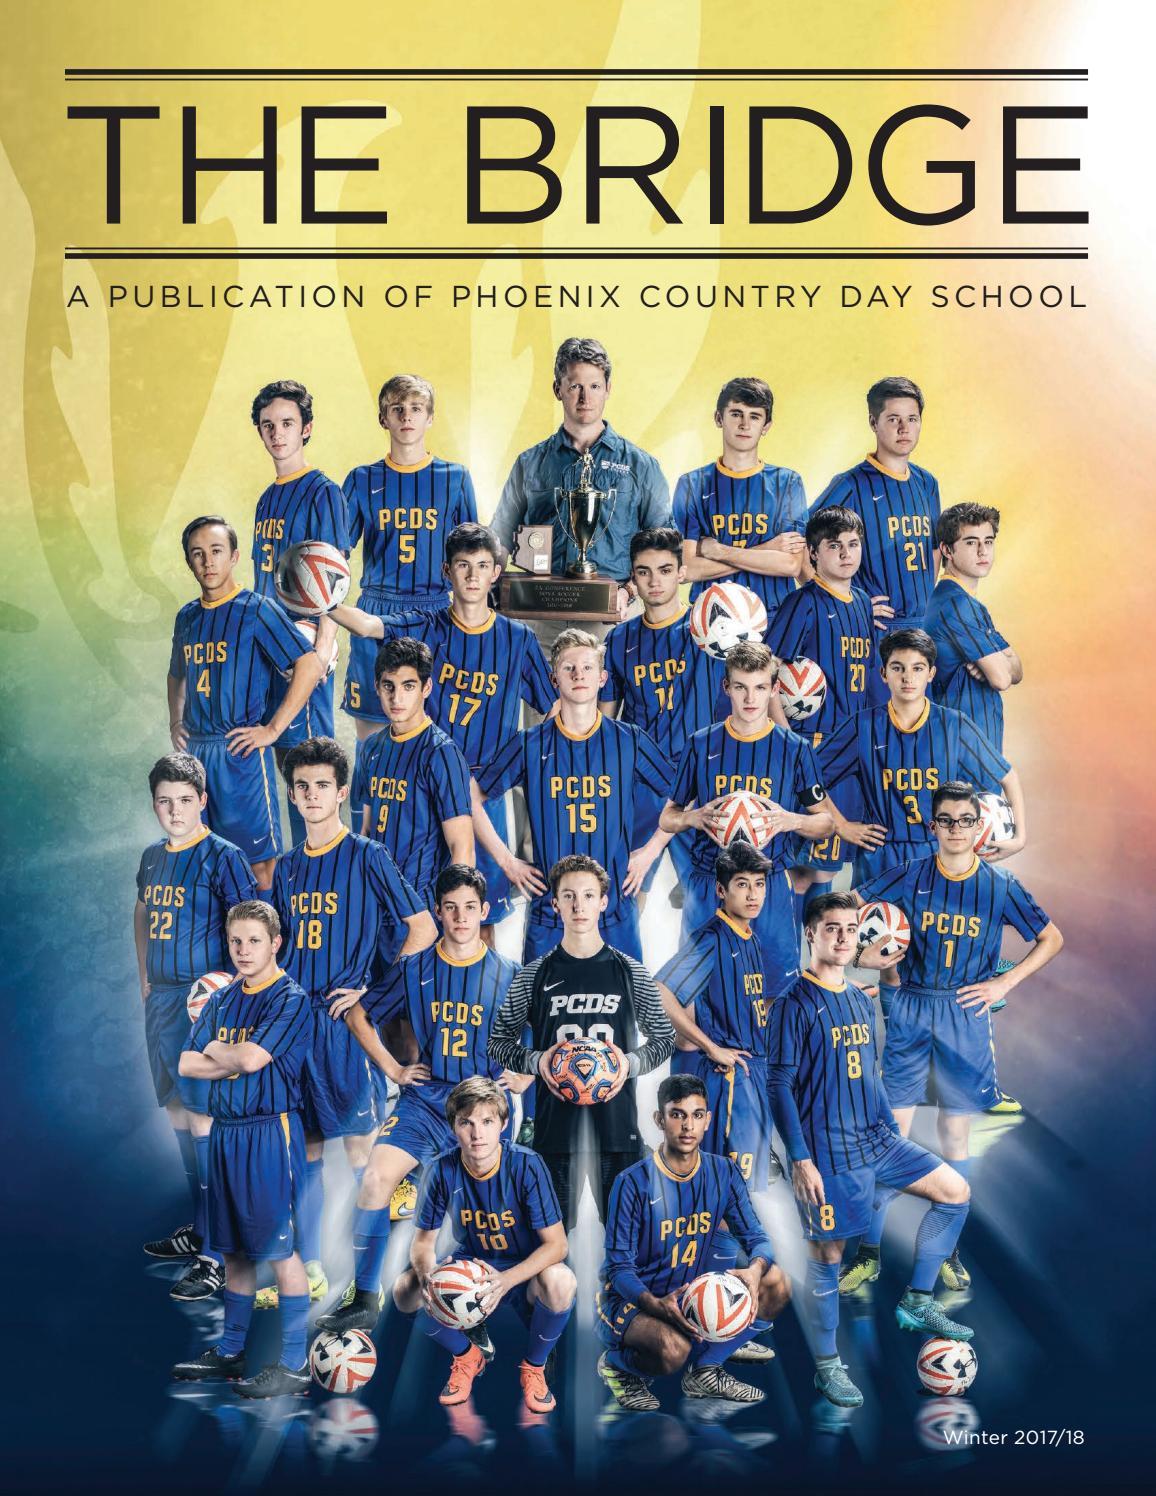 The Bridge Magazine, Winter 2017/18 by Phoenix Country Day